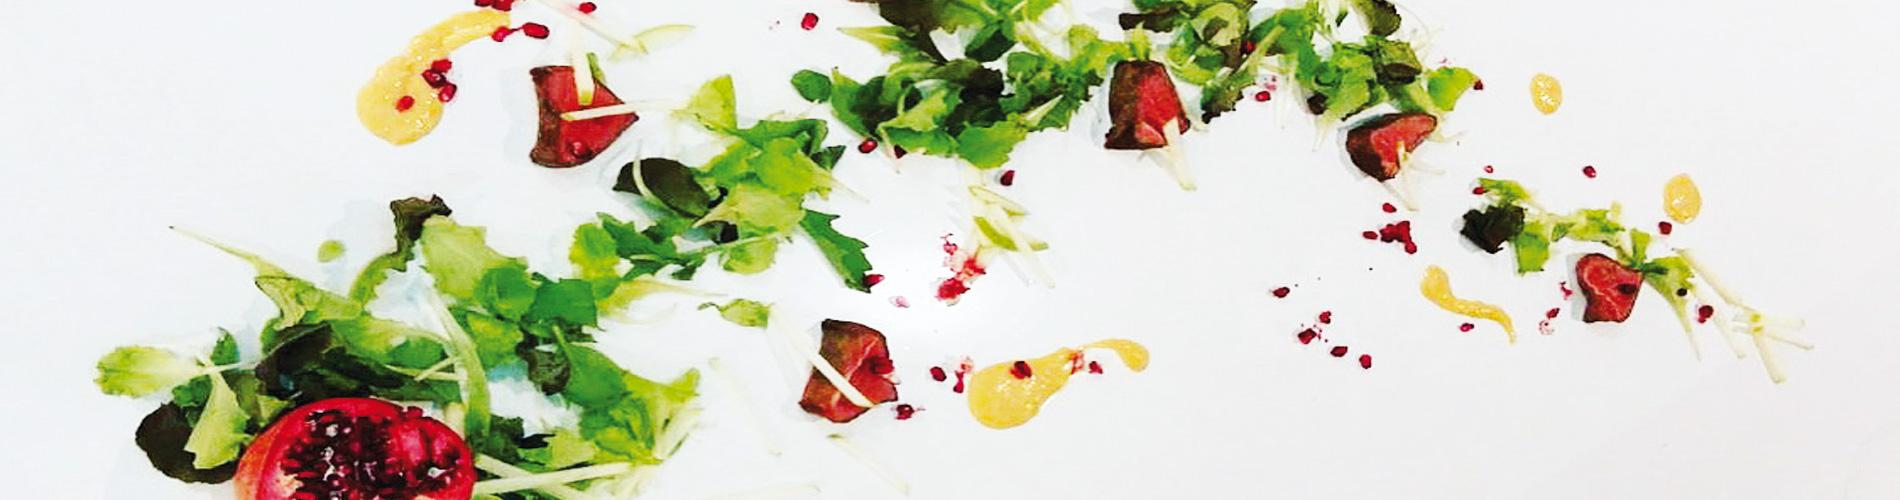 chef carlo olivari renoir